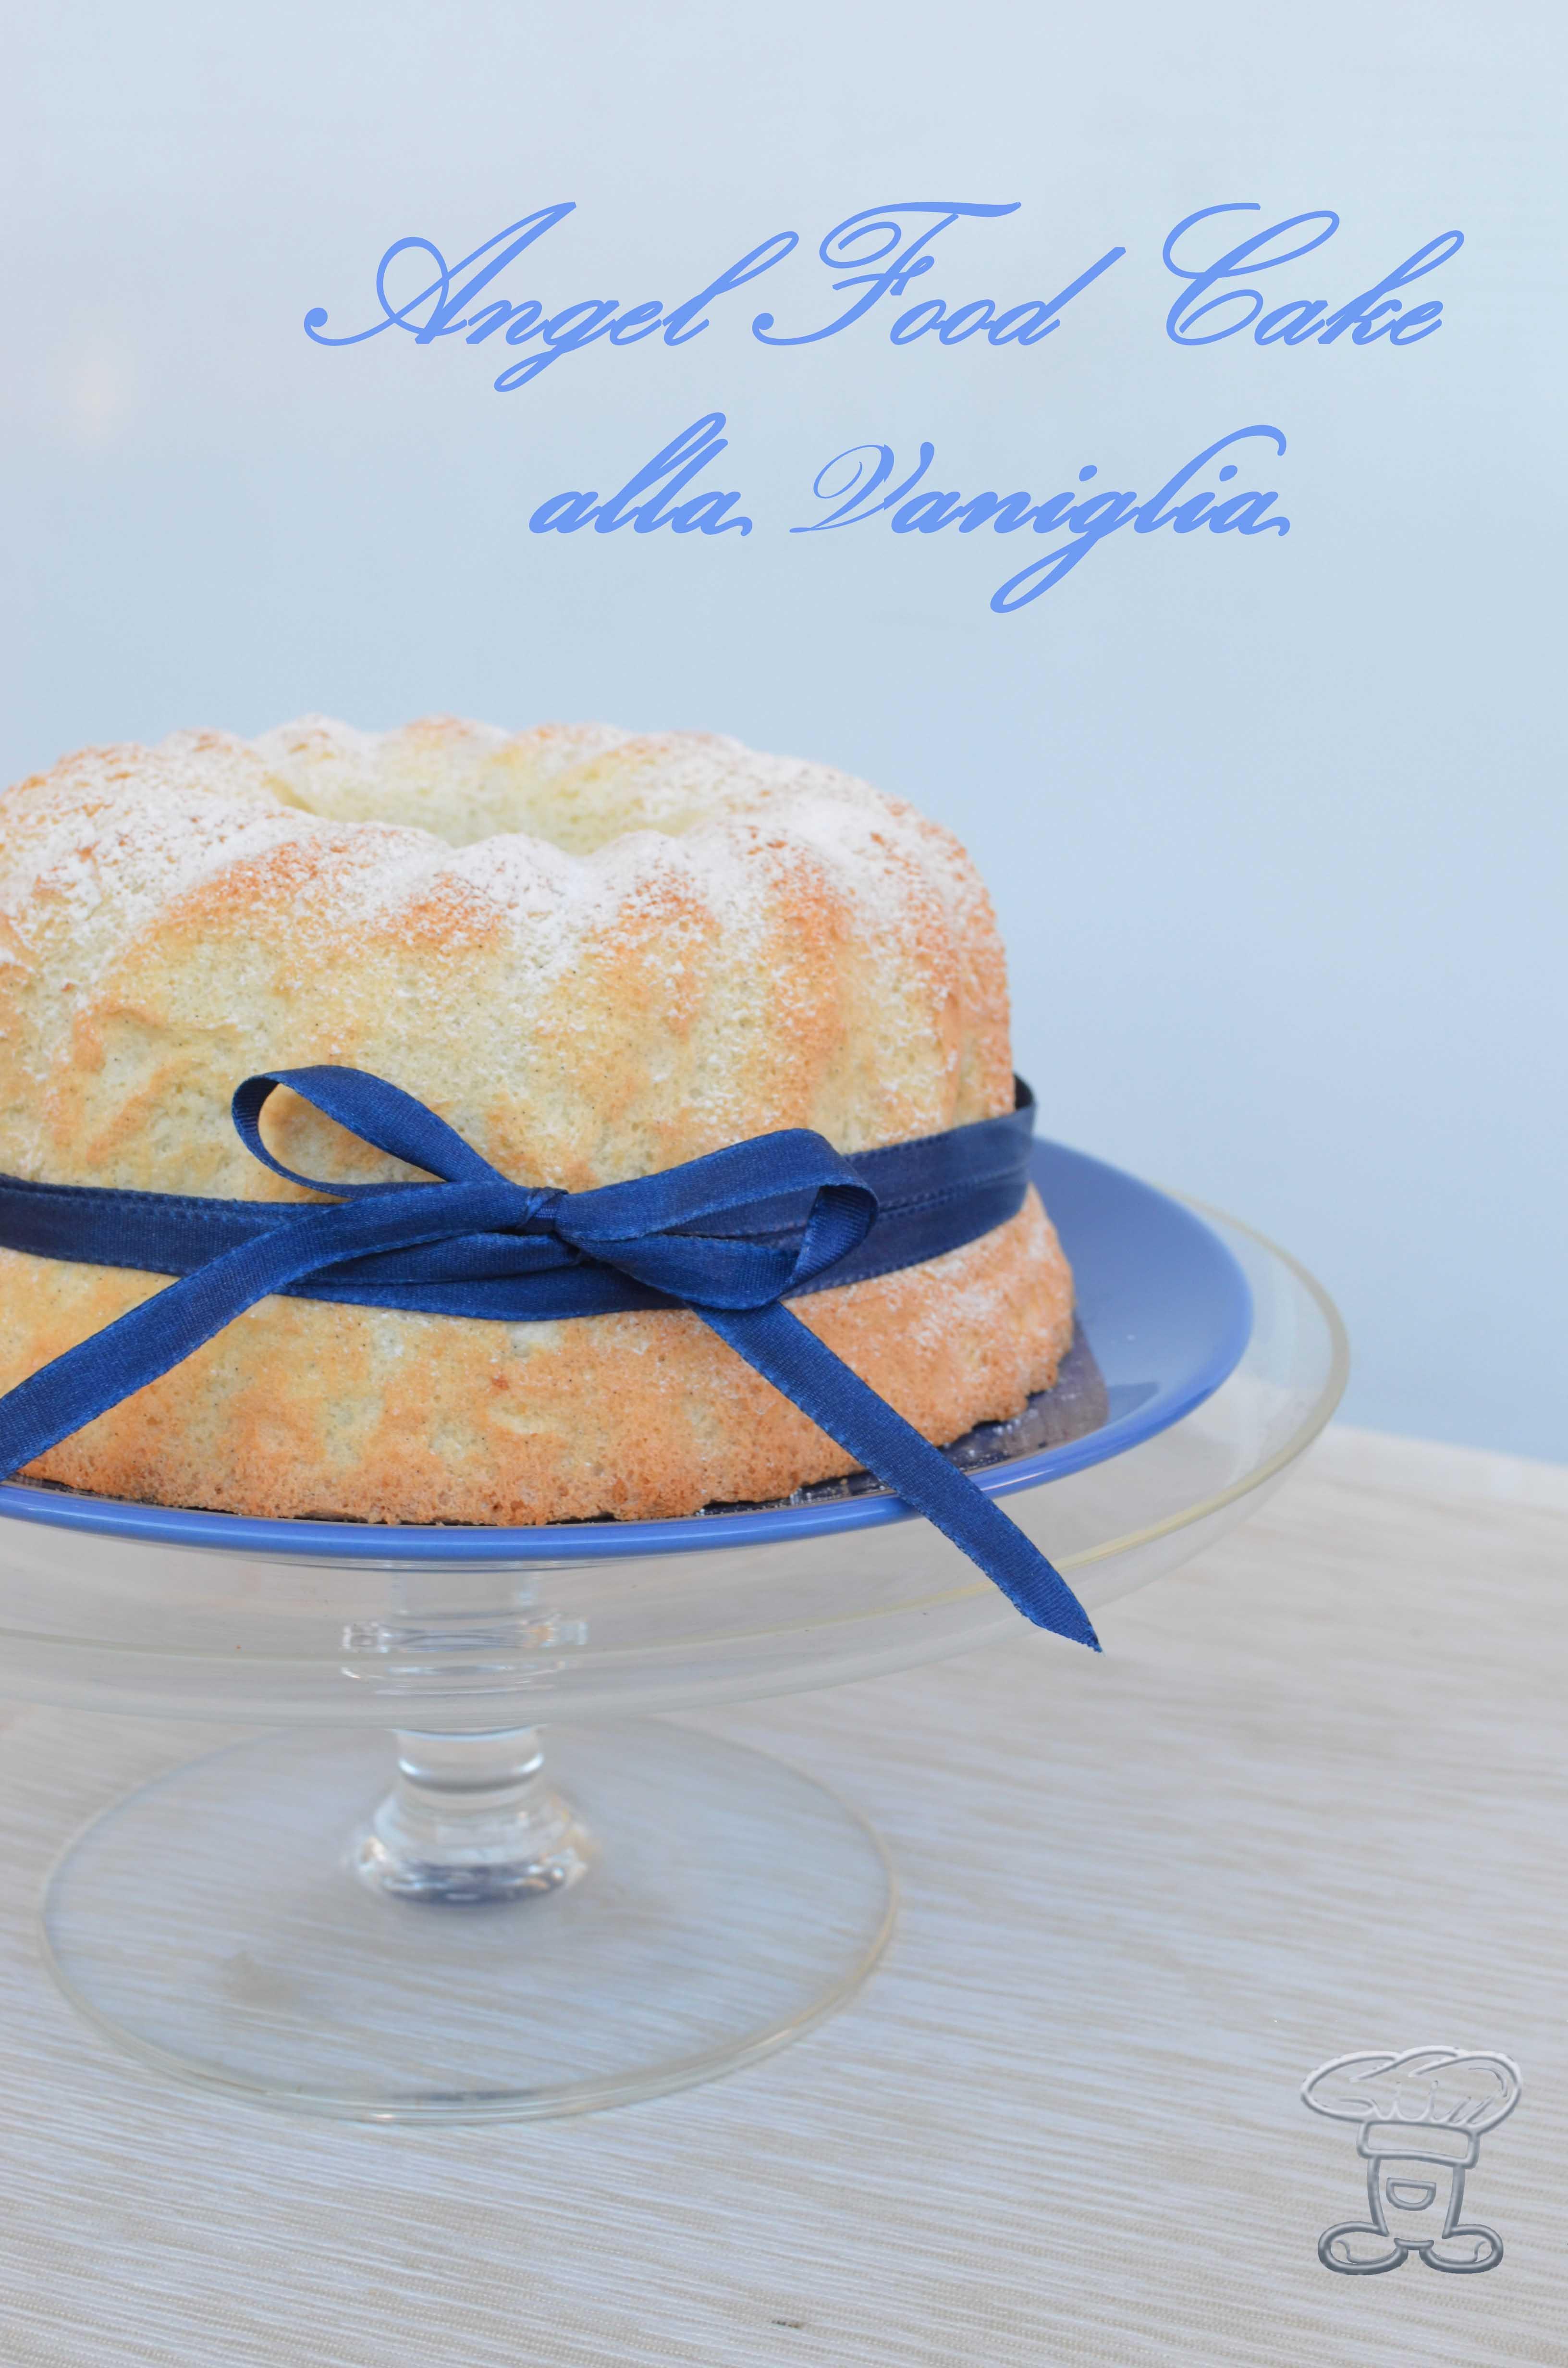 dsc_0704 Angel Food Cake alla Vaniglia